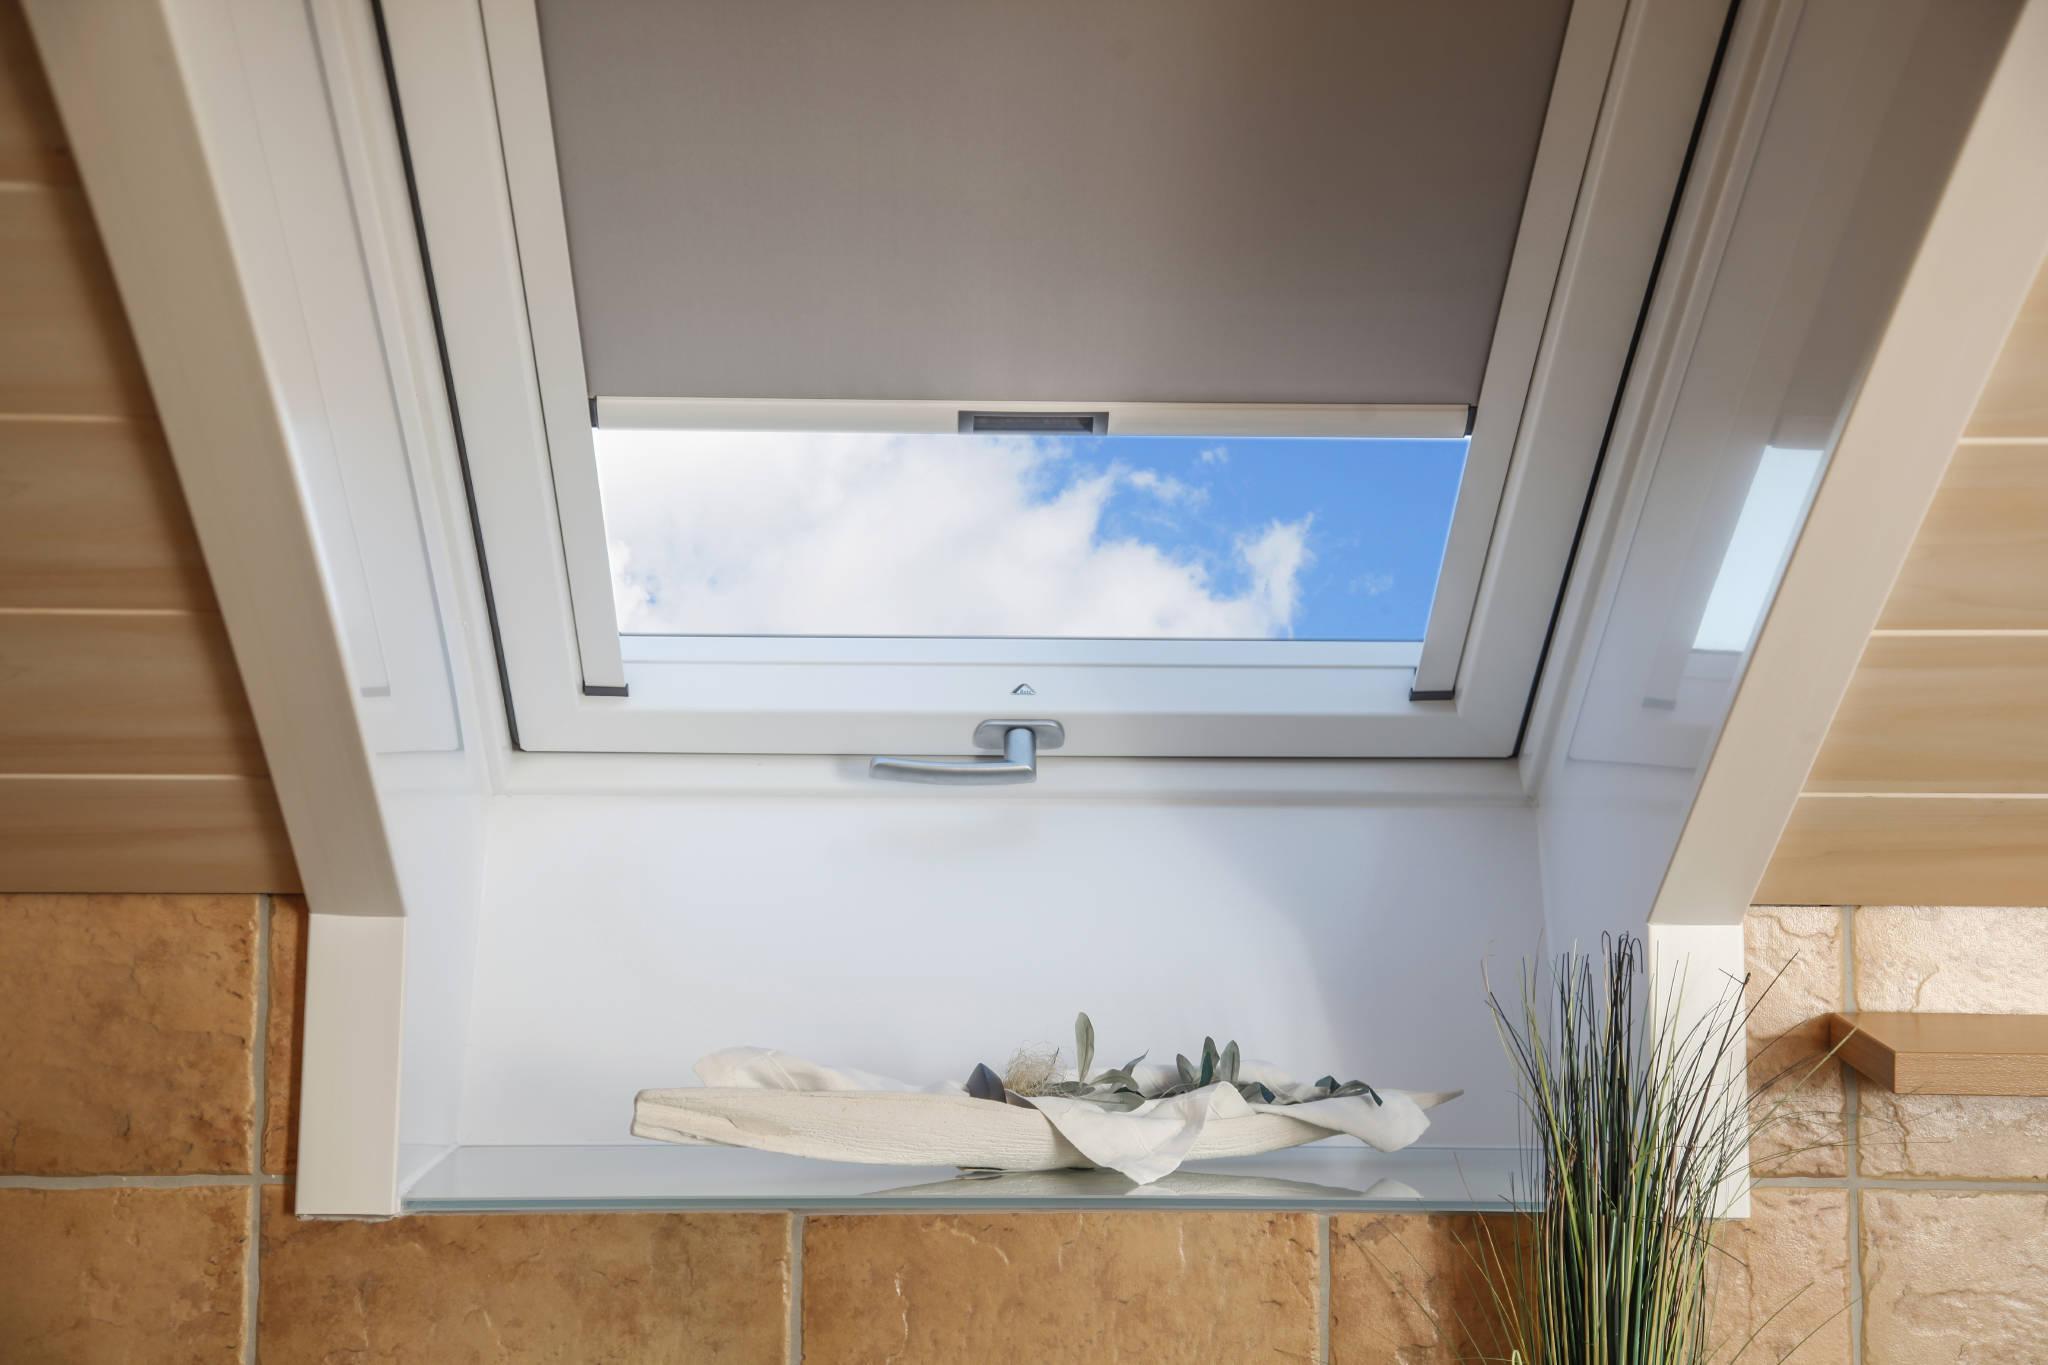 Sonnenschutz am Fenster